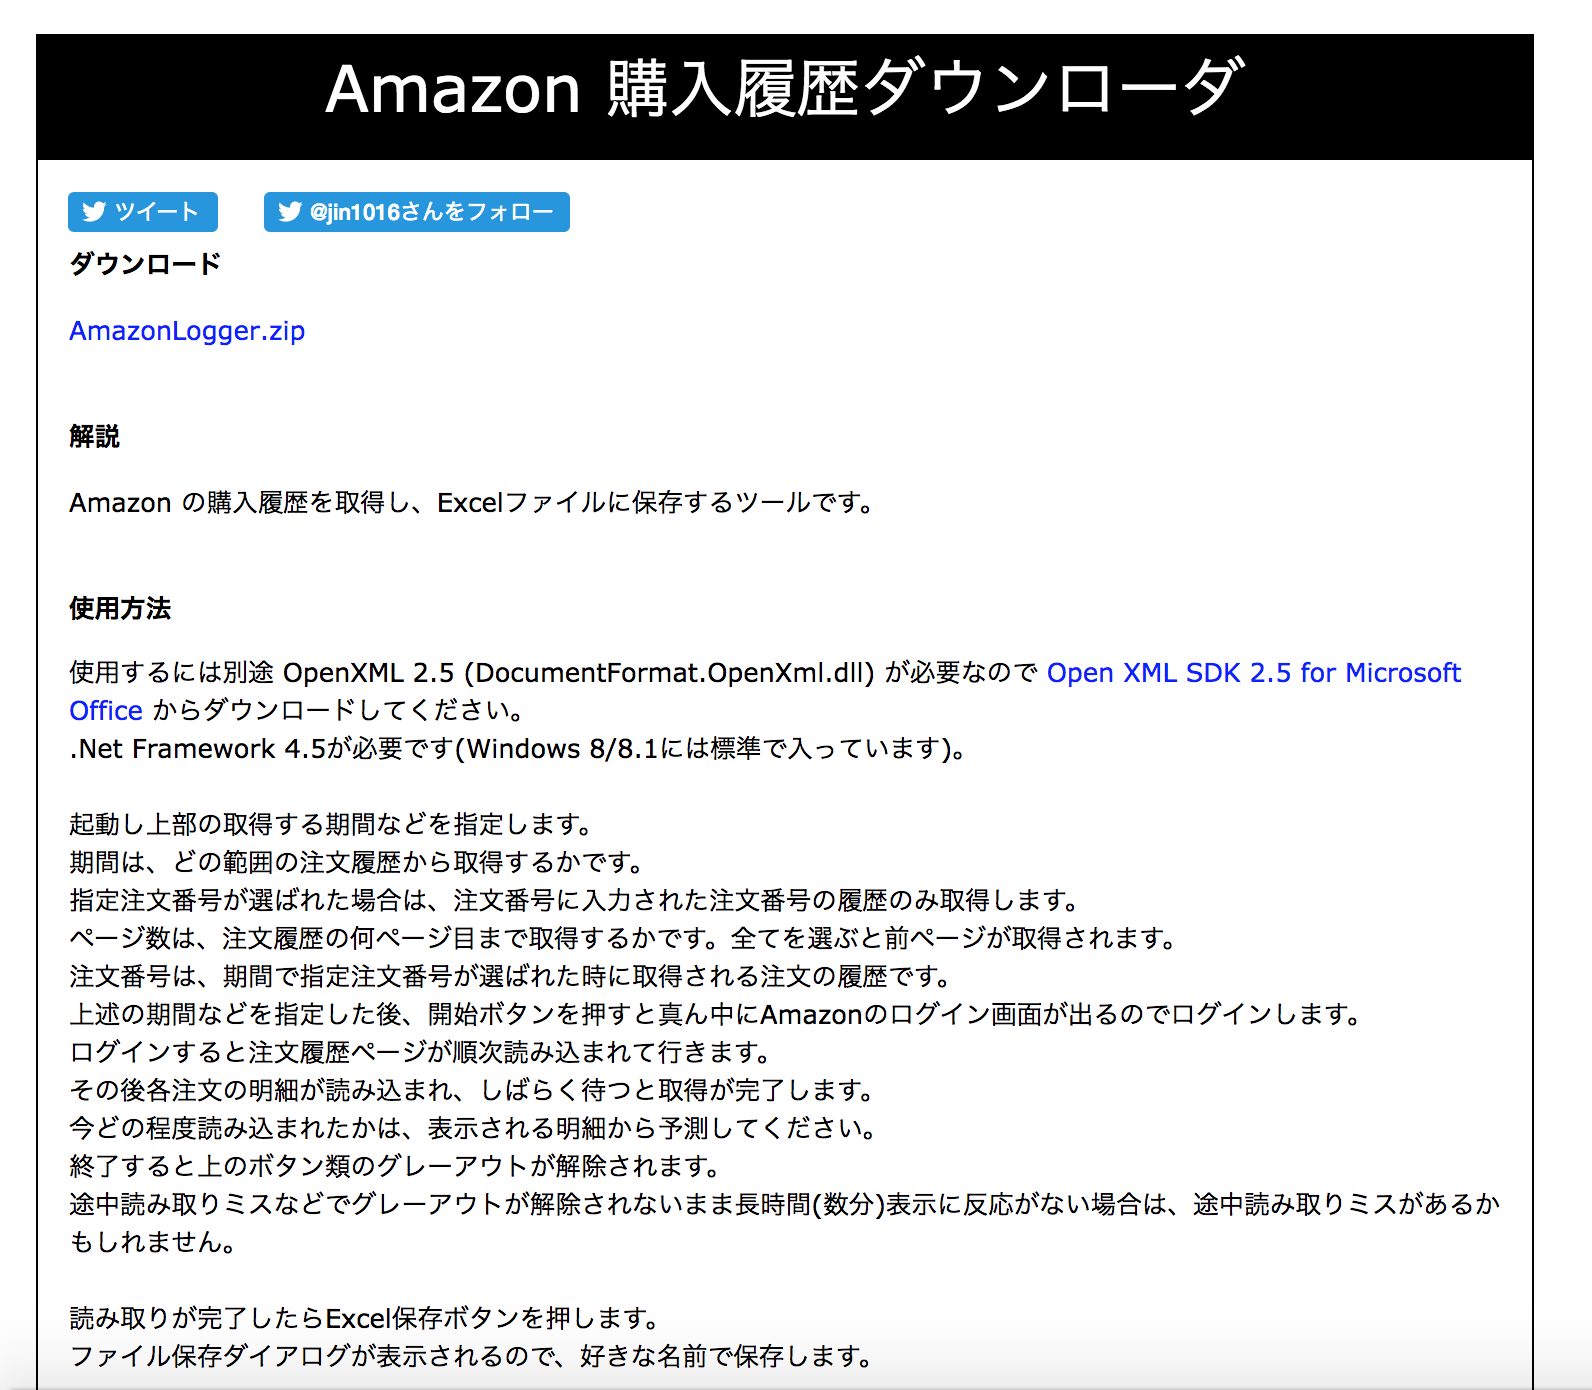 Amazon購入履歴